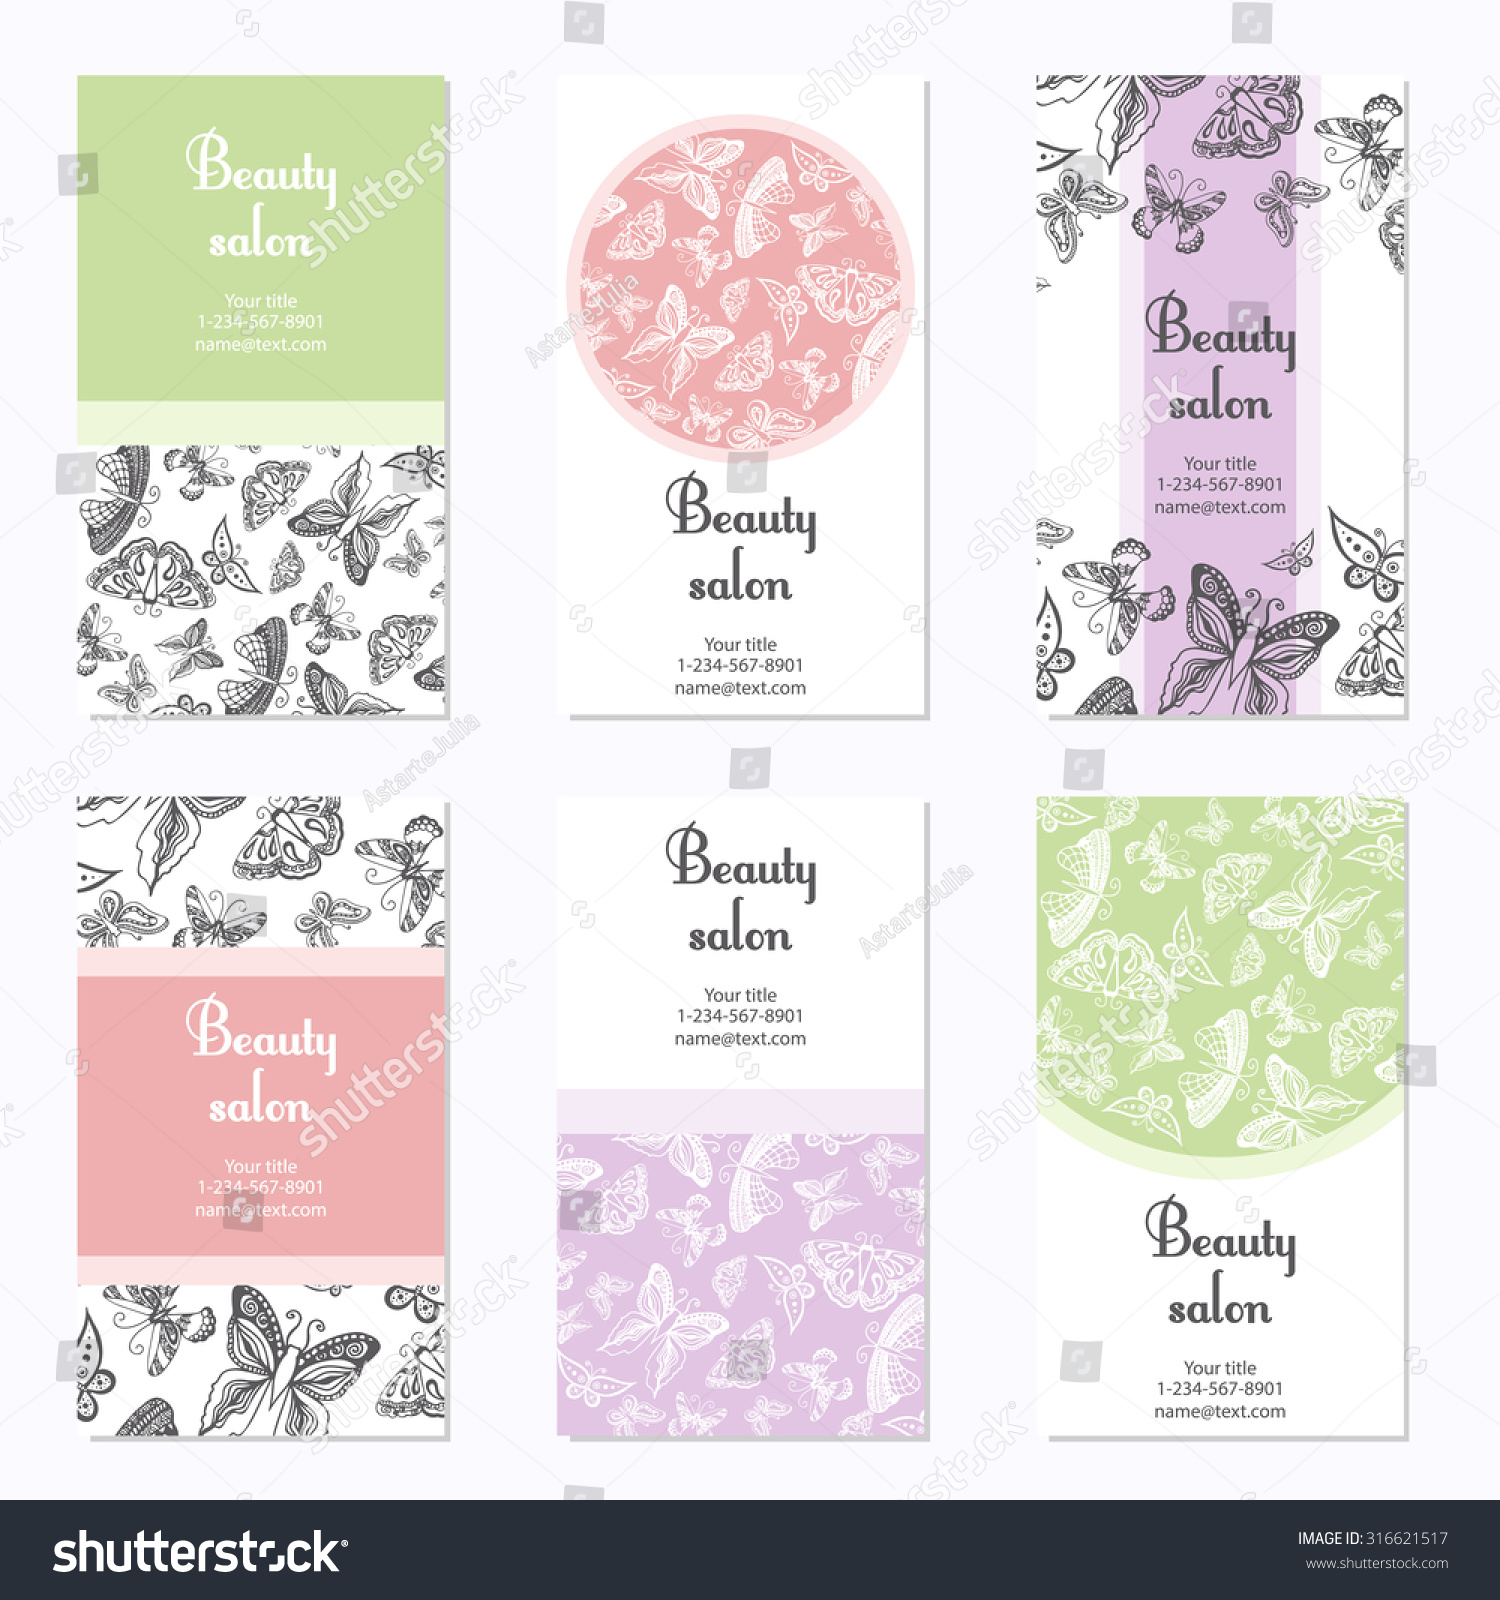 Set Beauty Salon Business Cards Butterfly Stock Photo (Photo, Vector ...